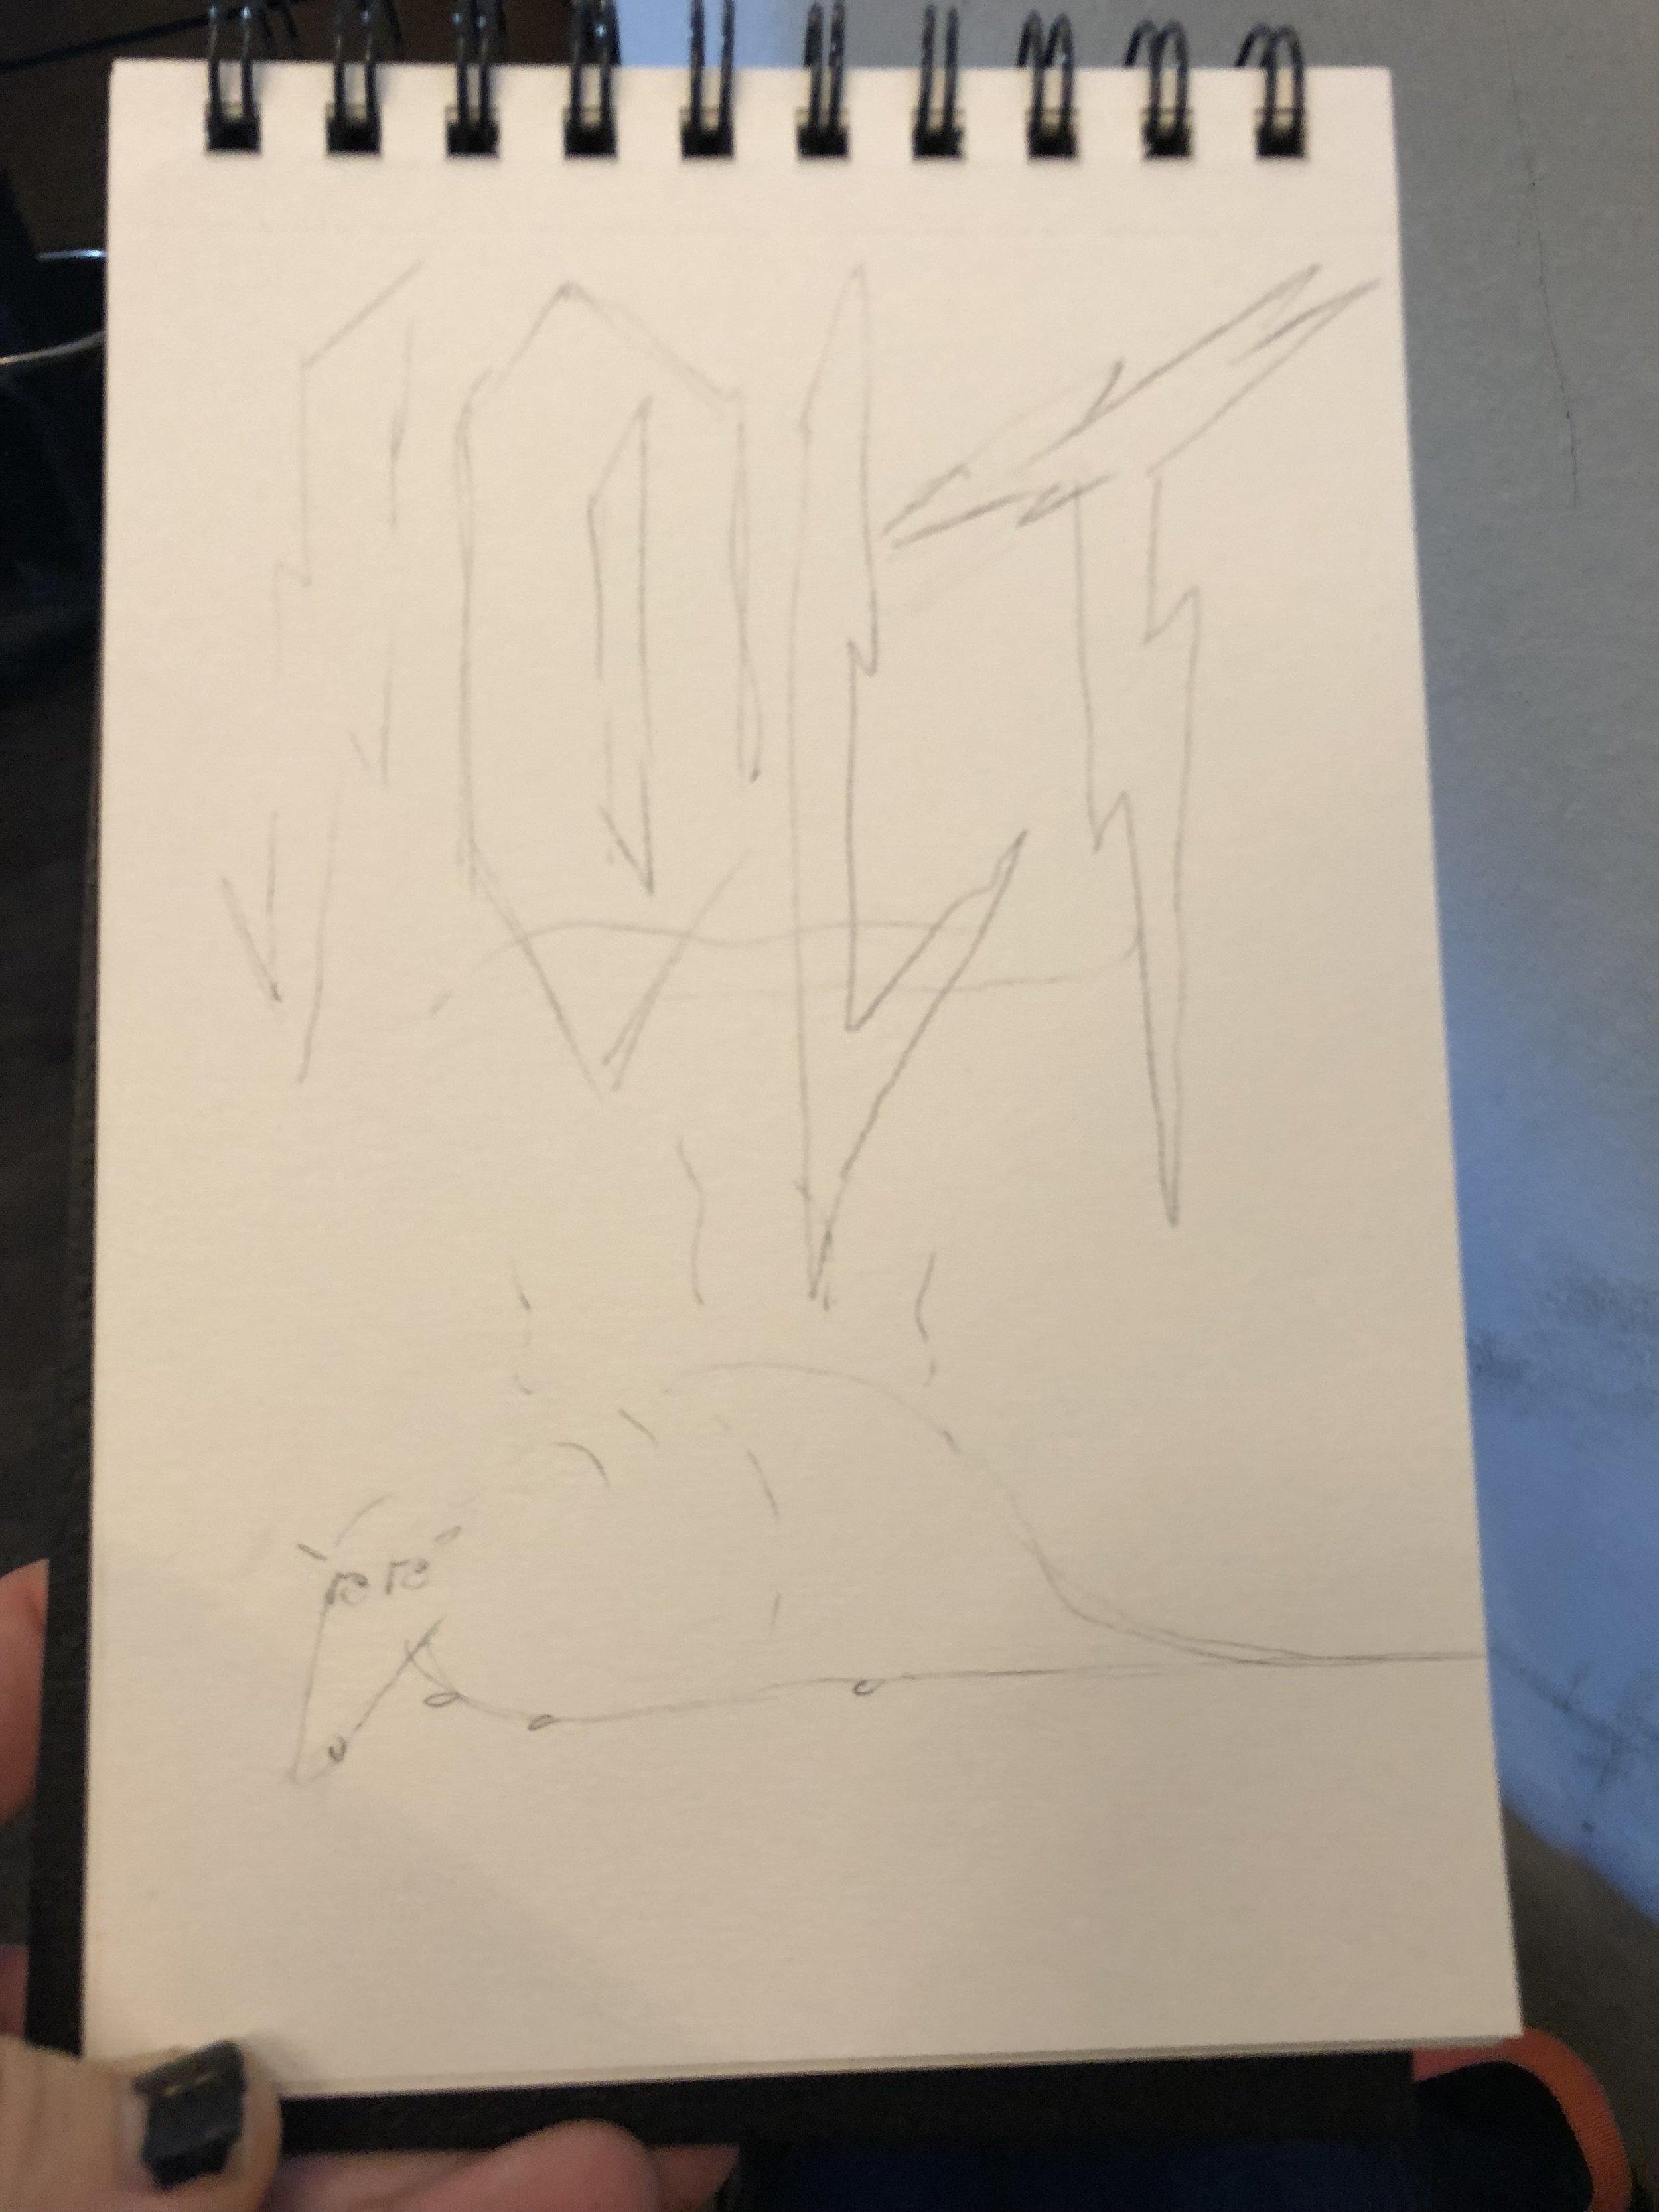 aardvarrk pencil.JPG